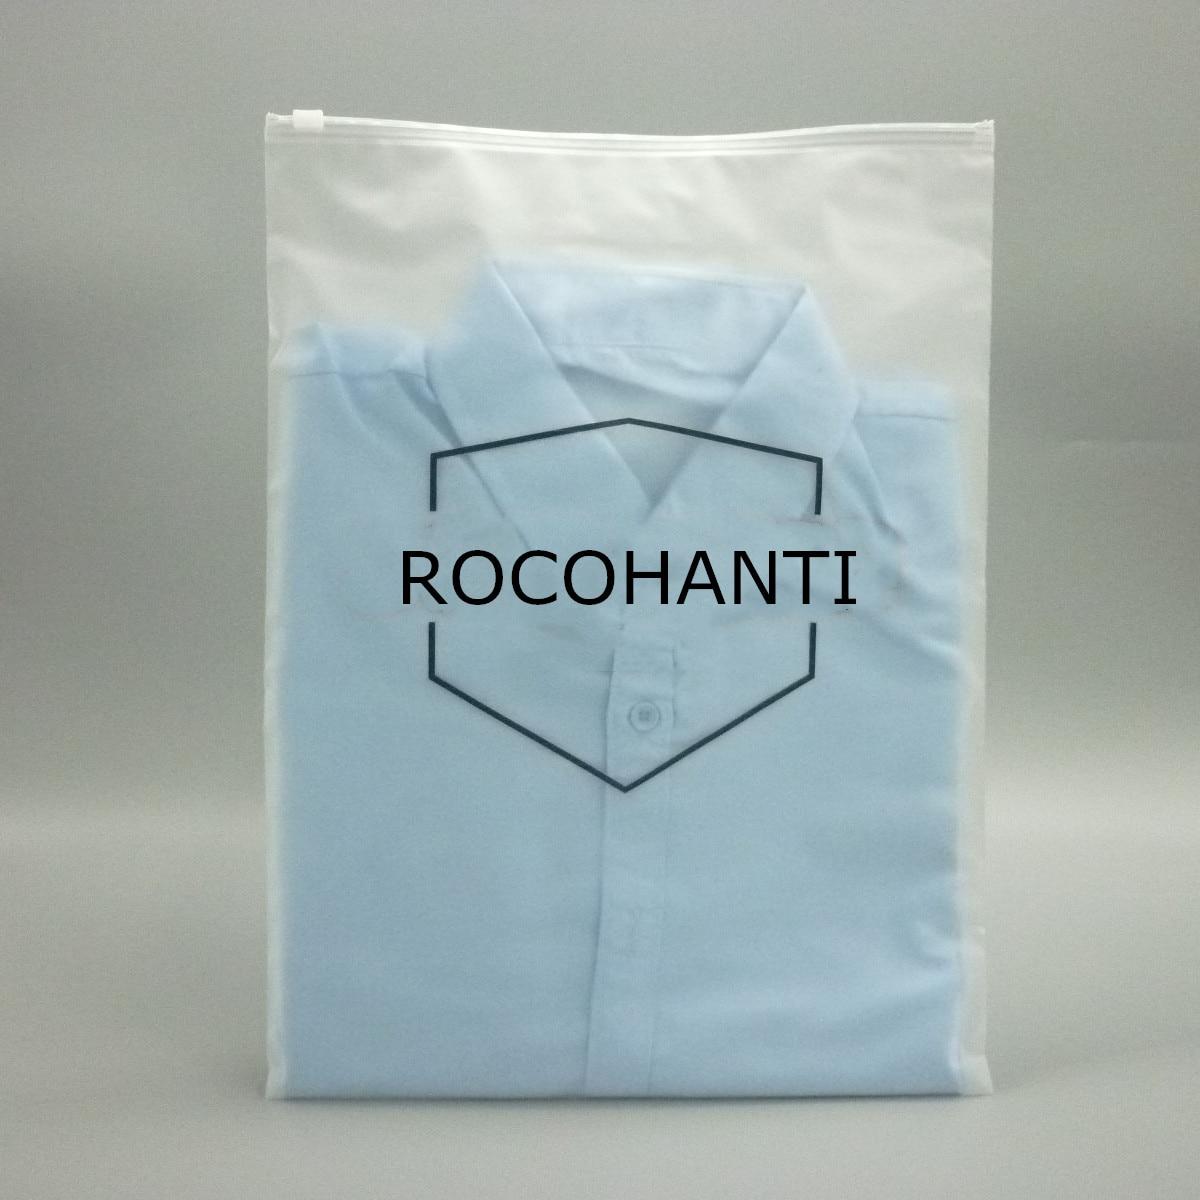 200x Matte Frosted Plastic Bag Customized Logo Printing Apparel Reusable Ziplock Bag Garment Towel T Shirt